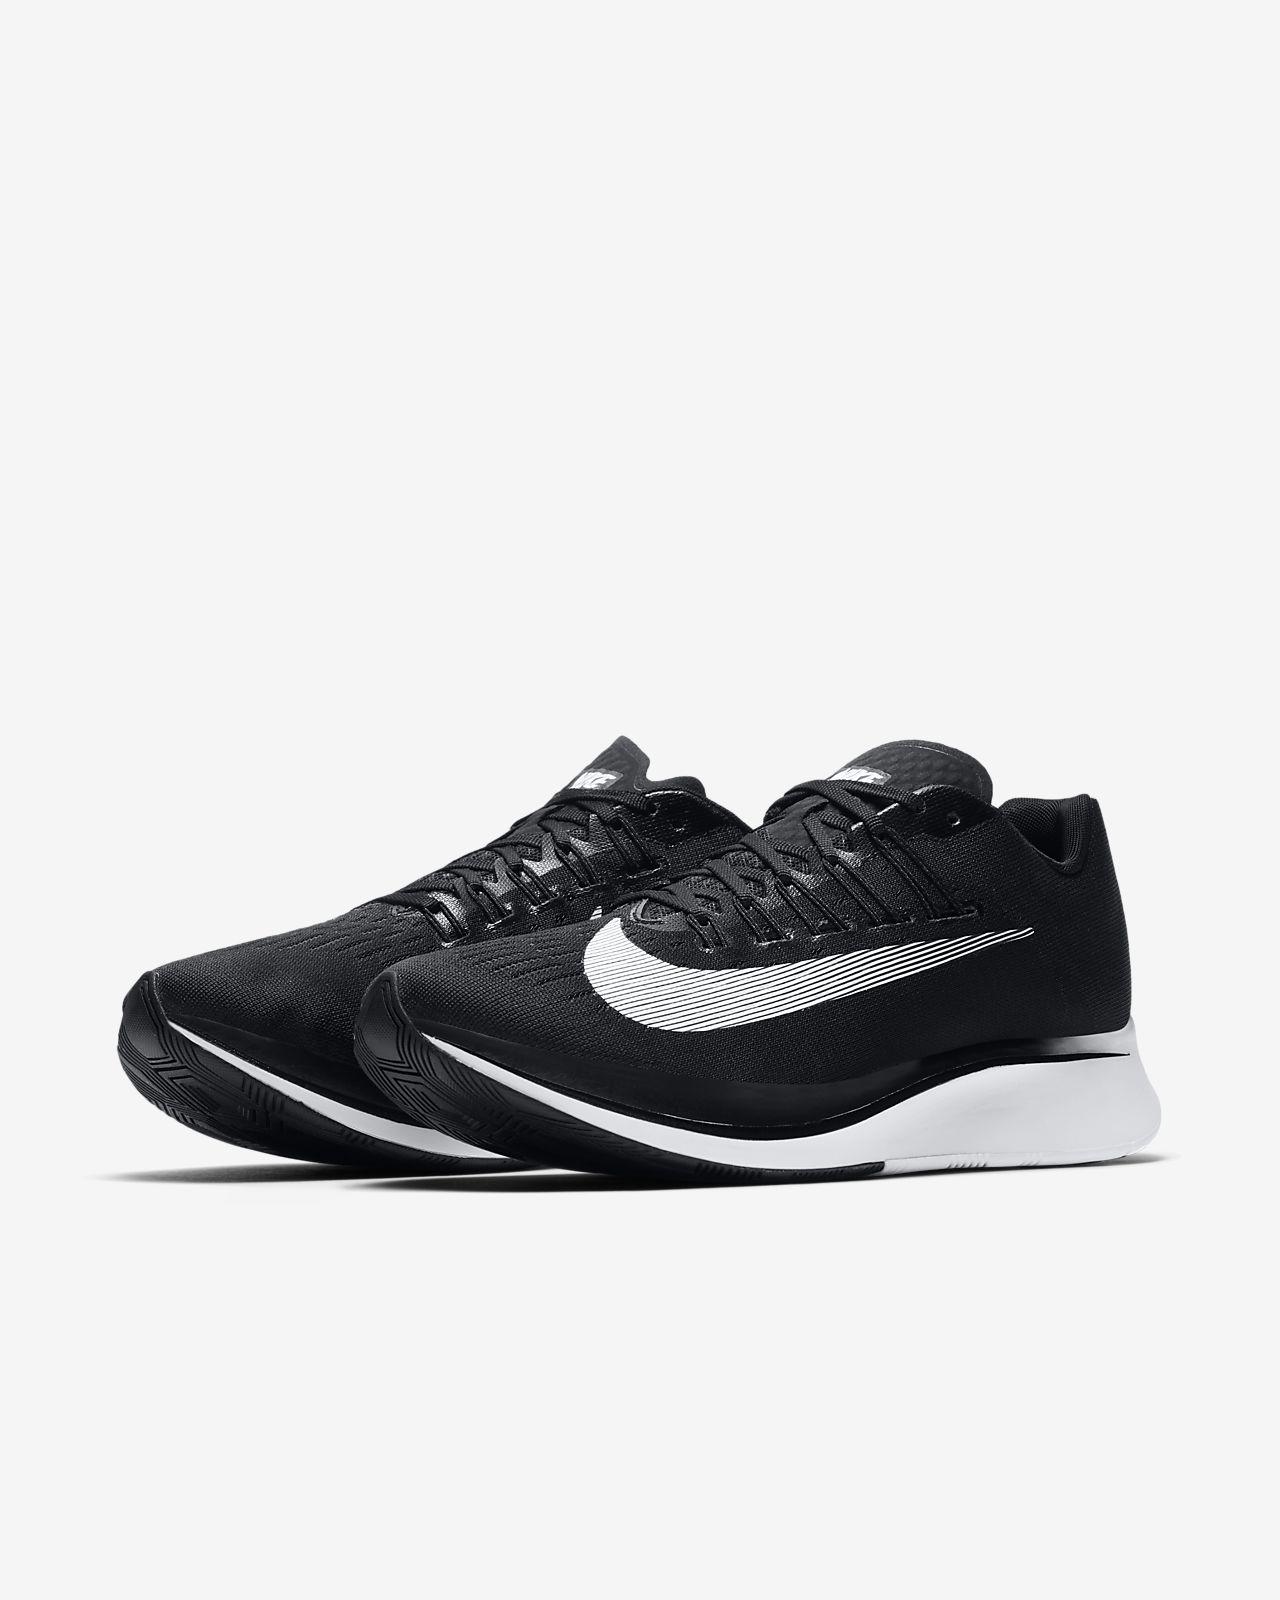 jordan shoes that don't crease fly foam cricket 808376